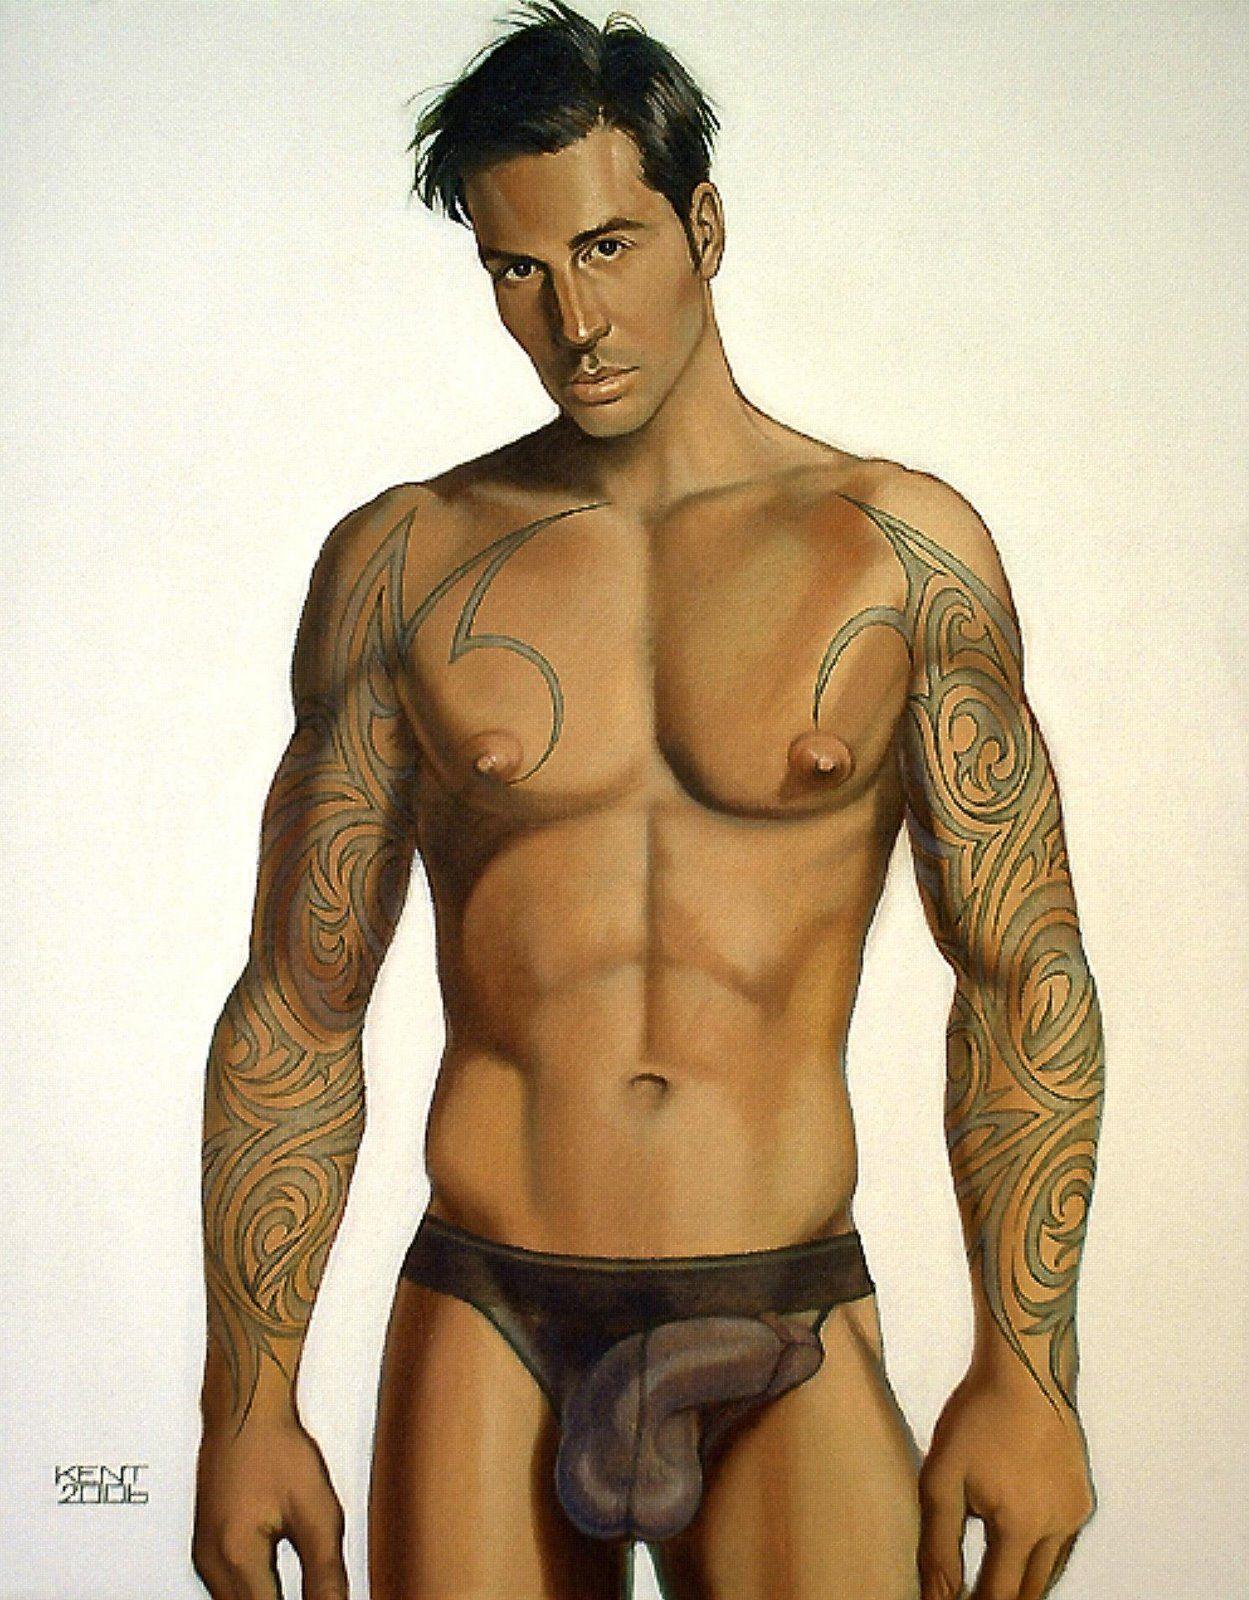 pinj wilson on gay art   pinterest   gay art, gay and cartoon boy